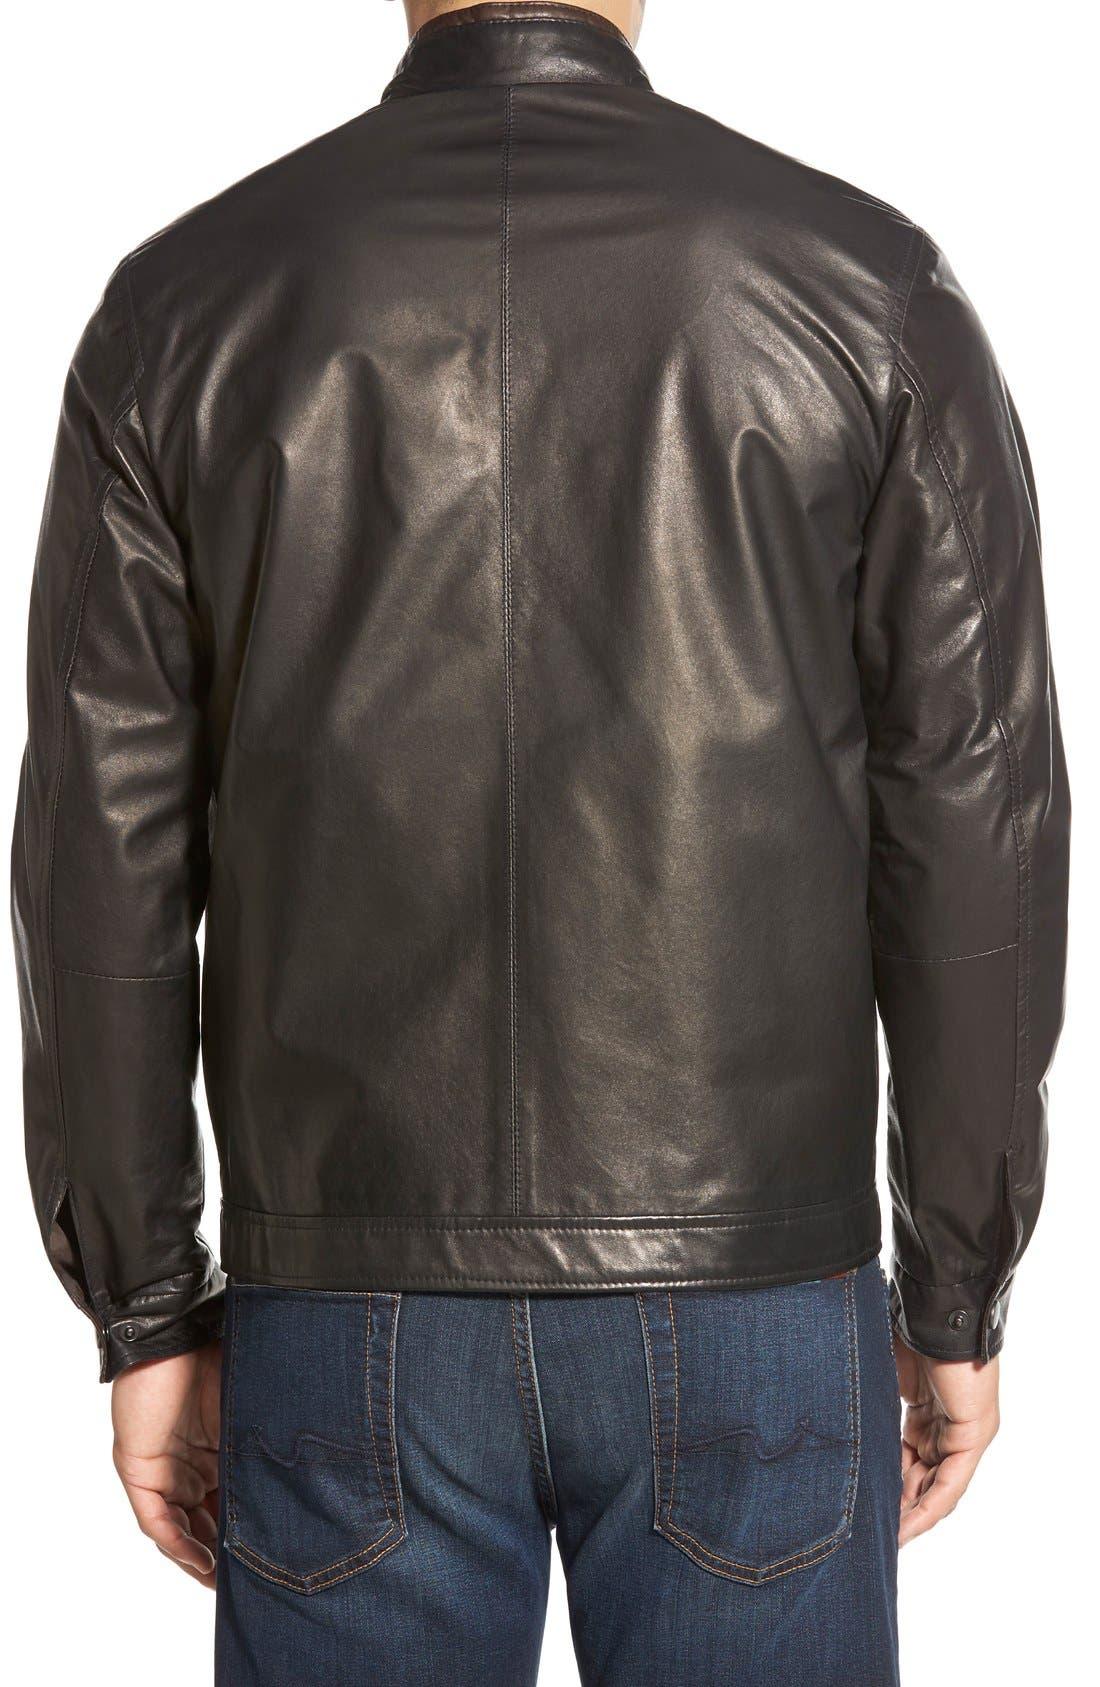 Lambskin Leather Jacket,                             Alternate thumbnail 2, color,                             MIDNITE